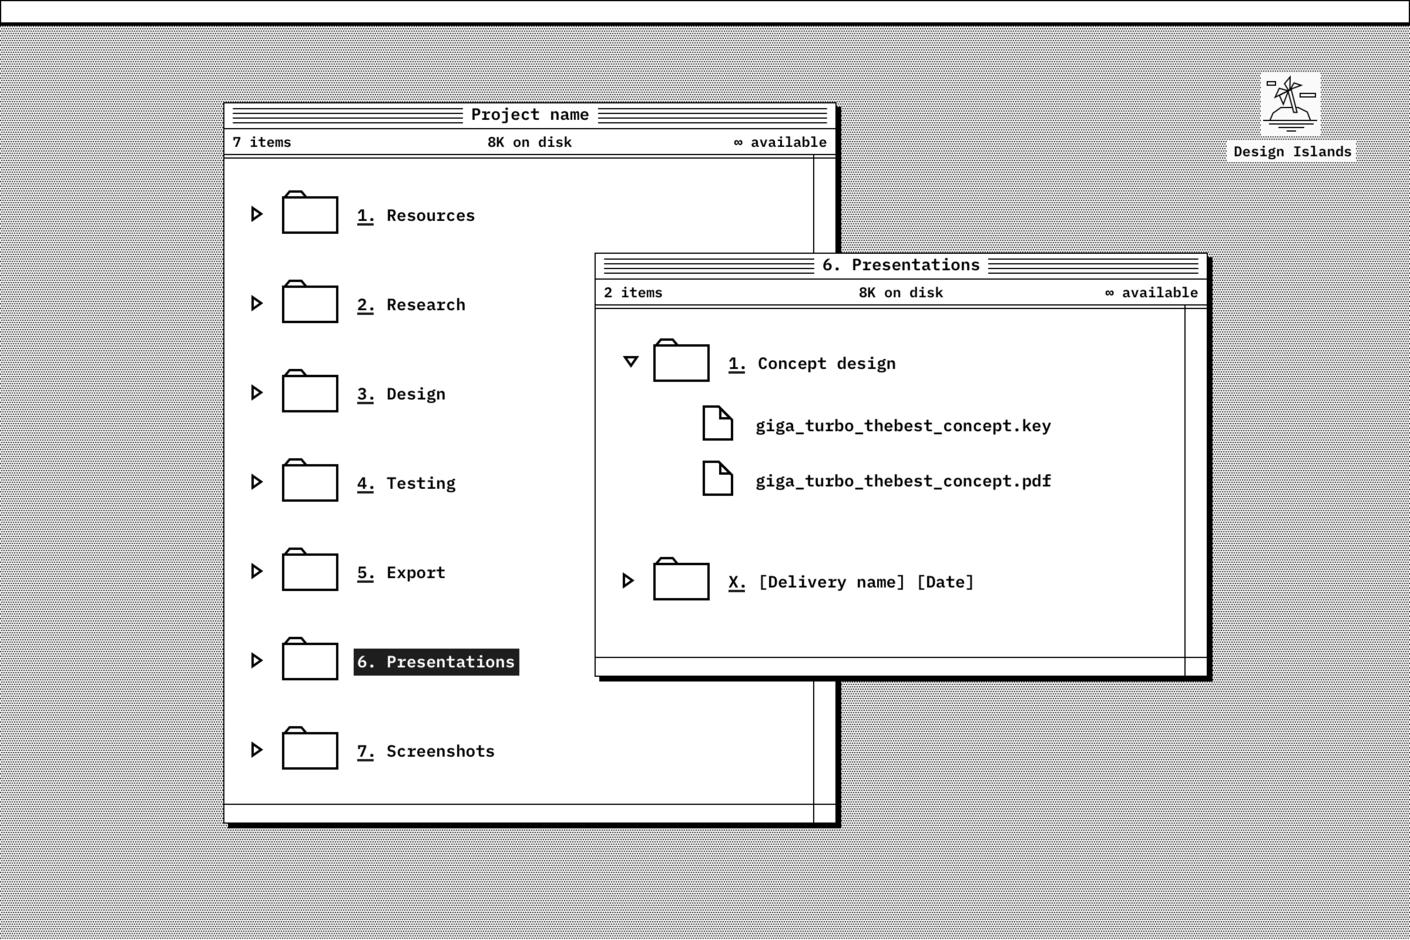 Presentations folder